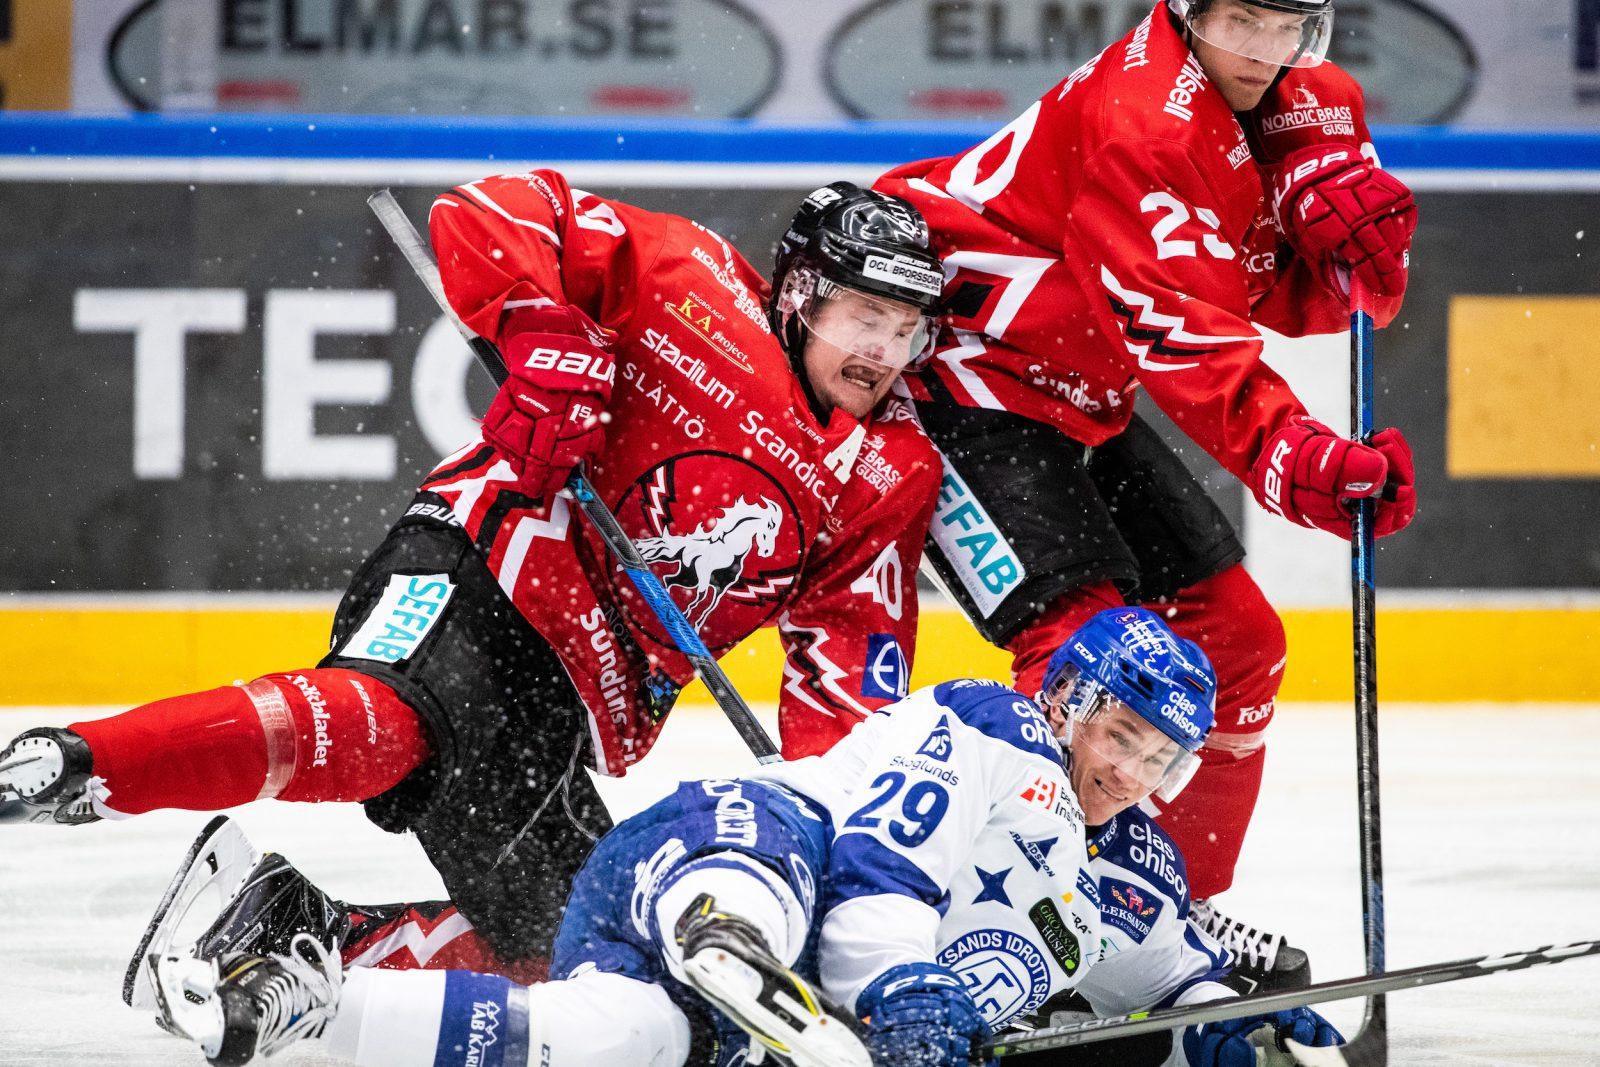 SKODA TROPHY: De ersätter Västerås